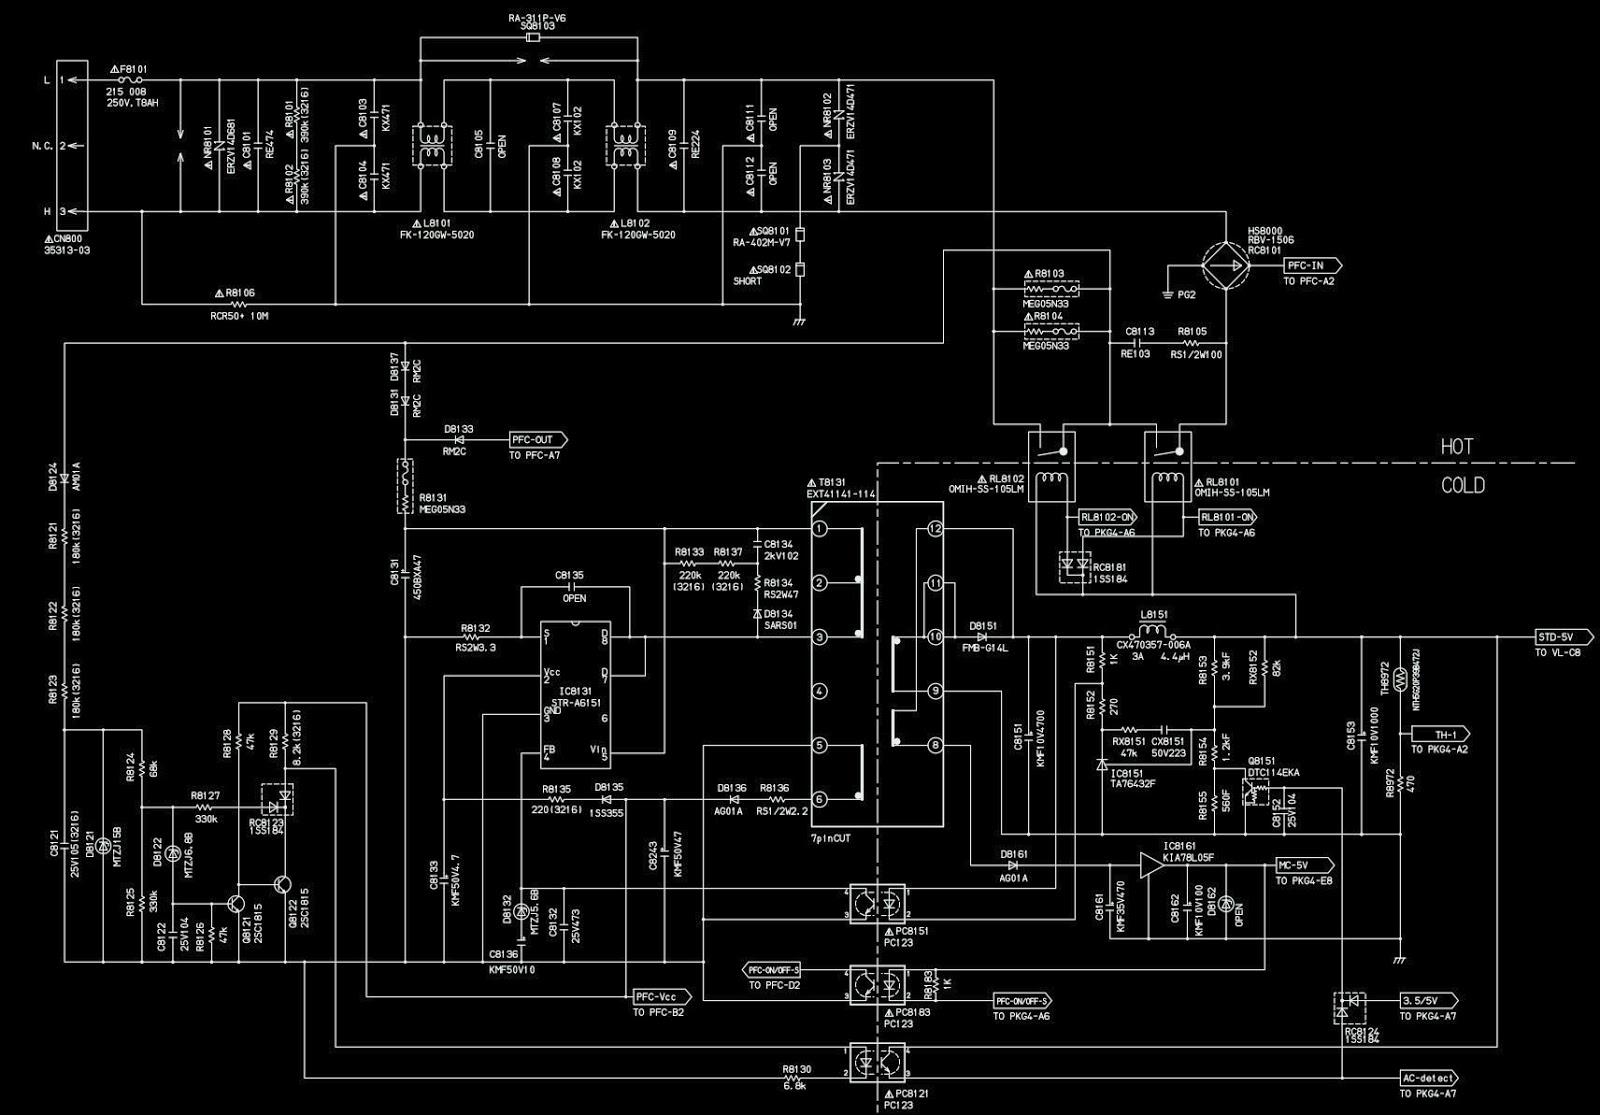 Schematic Diagrams  Samsung Ppm42h3 And Xoceco 6ha0182010 Model Ph